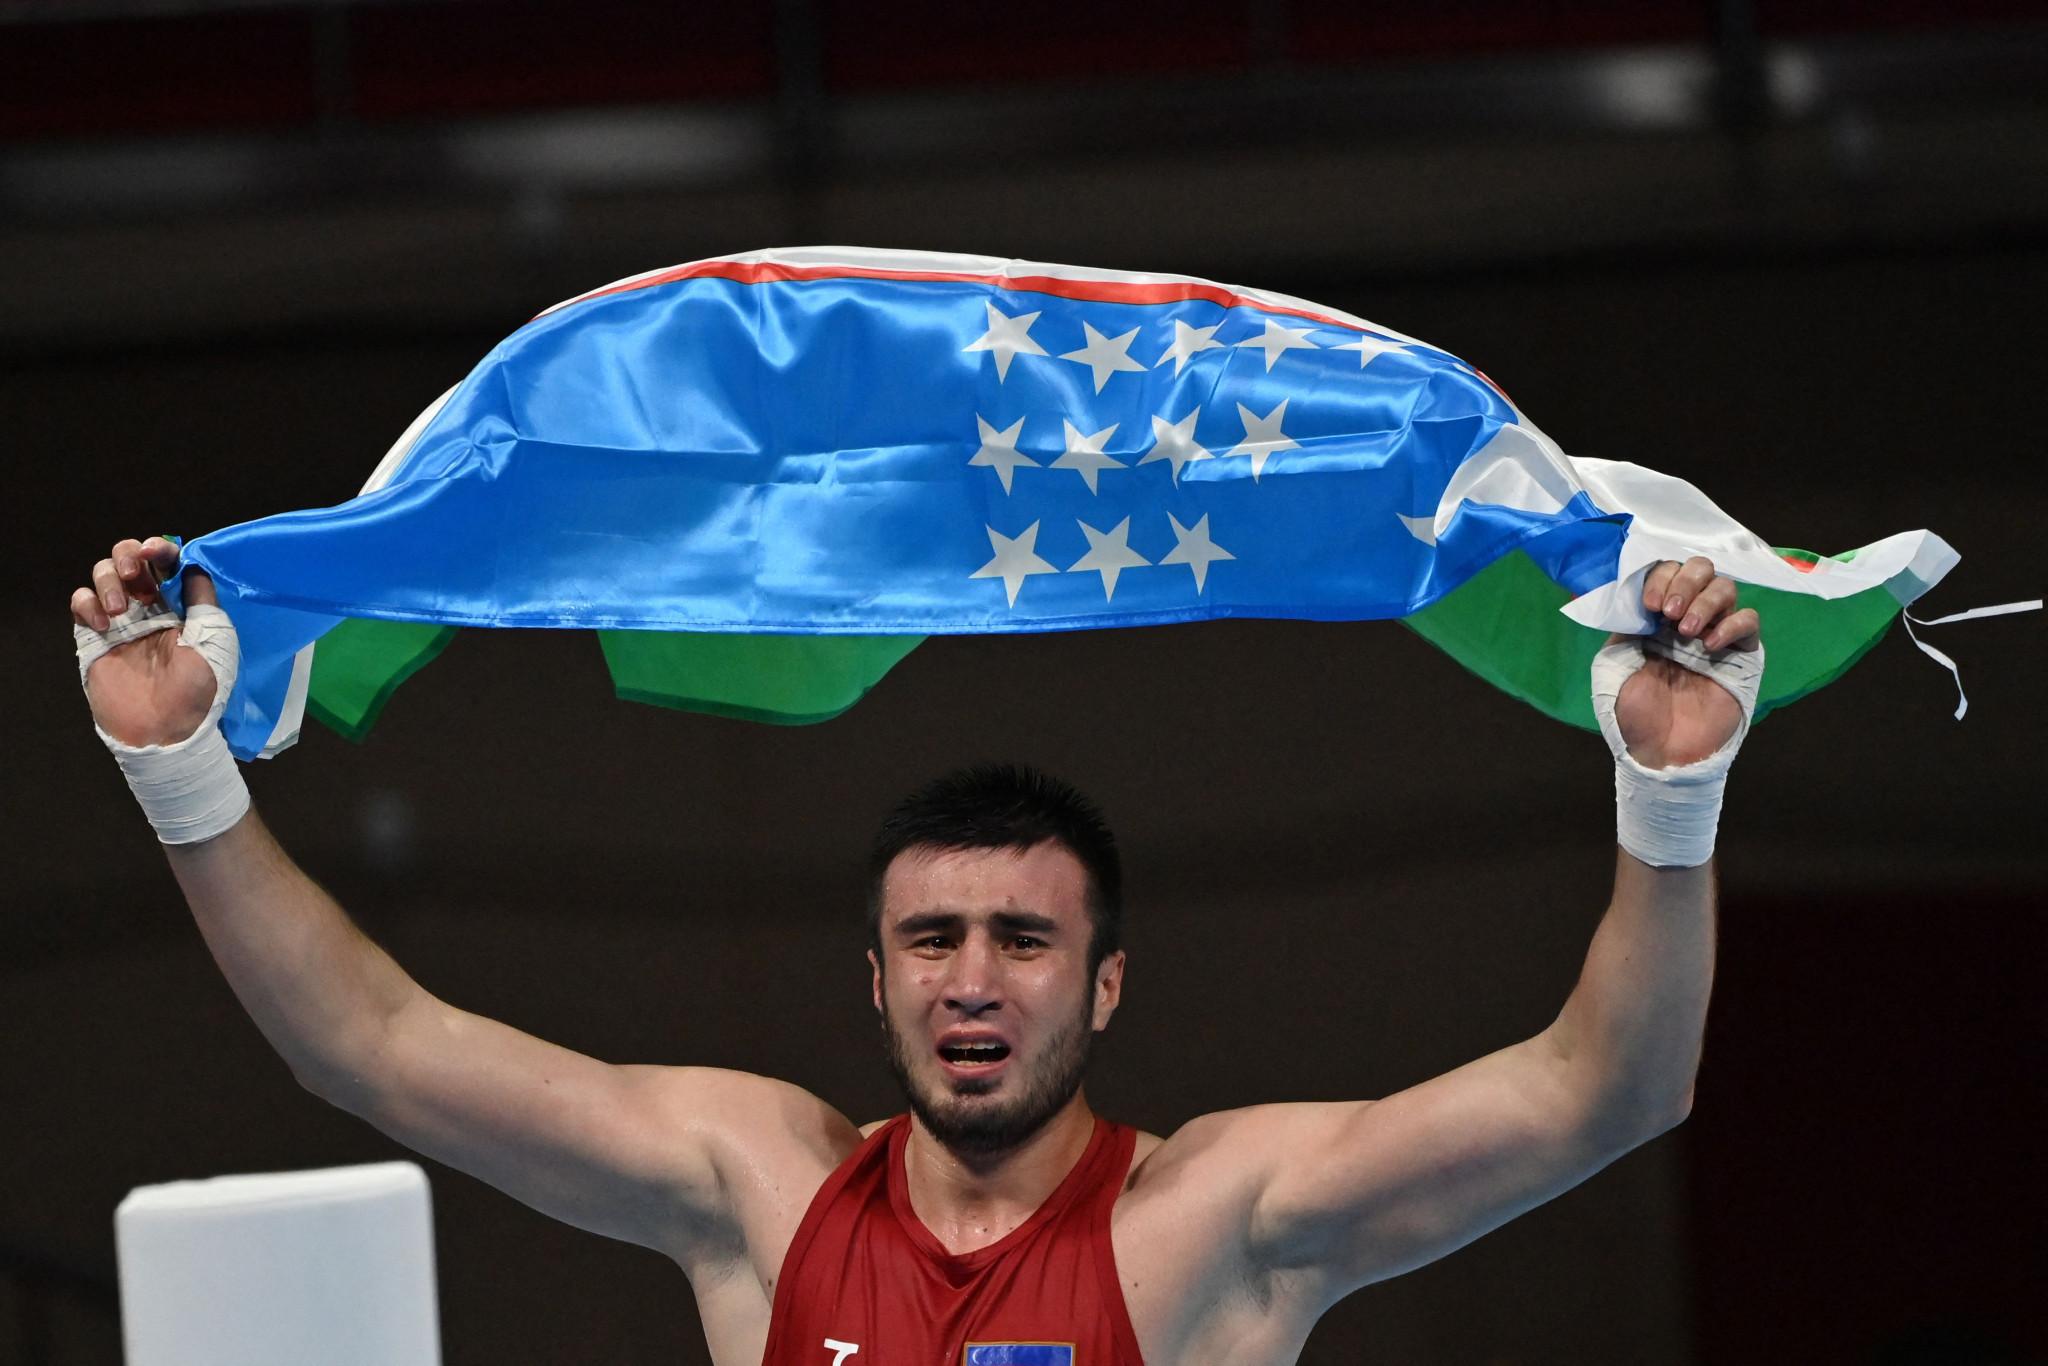 Bakhodir Jalolov won the men's super heavyweight title for Uzbekistan ©Getty Images